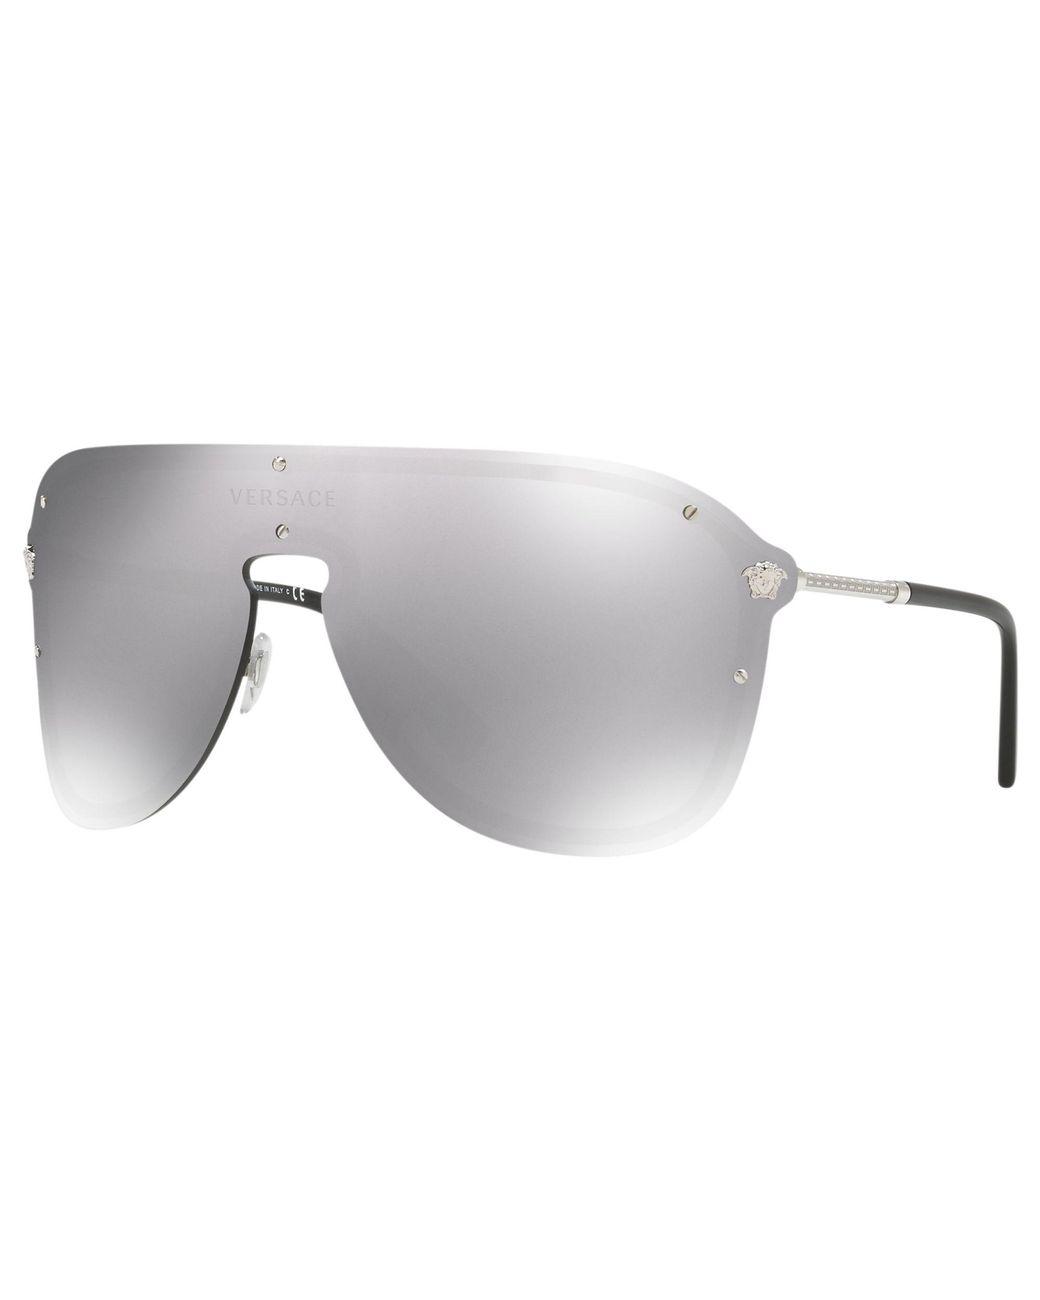 de28daf4026c0 Versace. Ve2180 Women s Aviator Sunglasses. £211 From John Lewis and  Partners